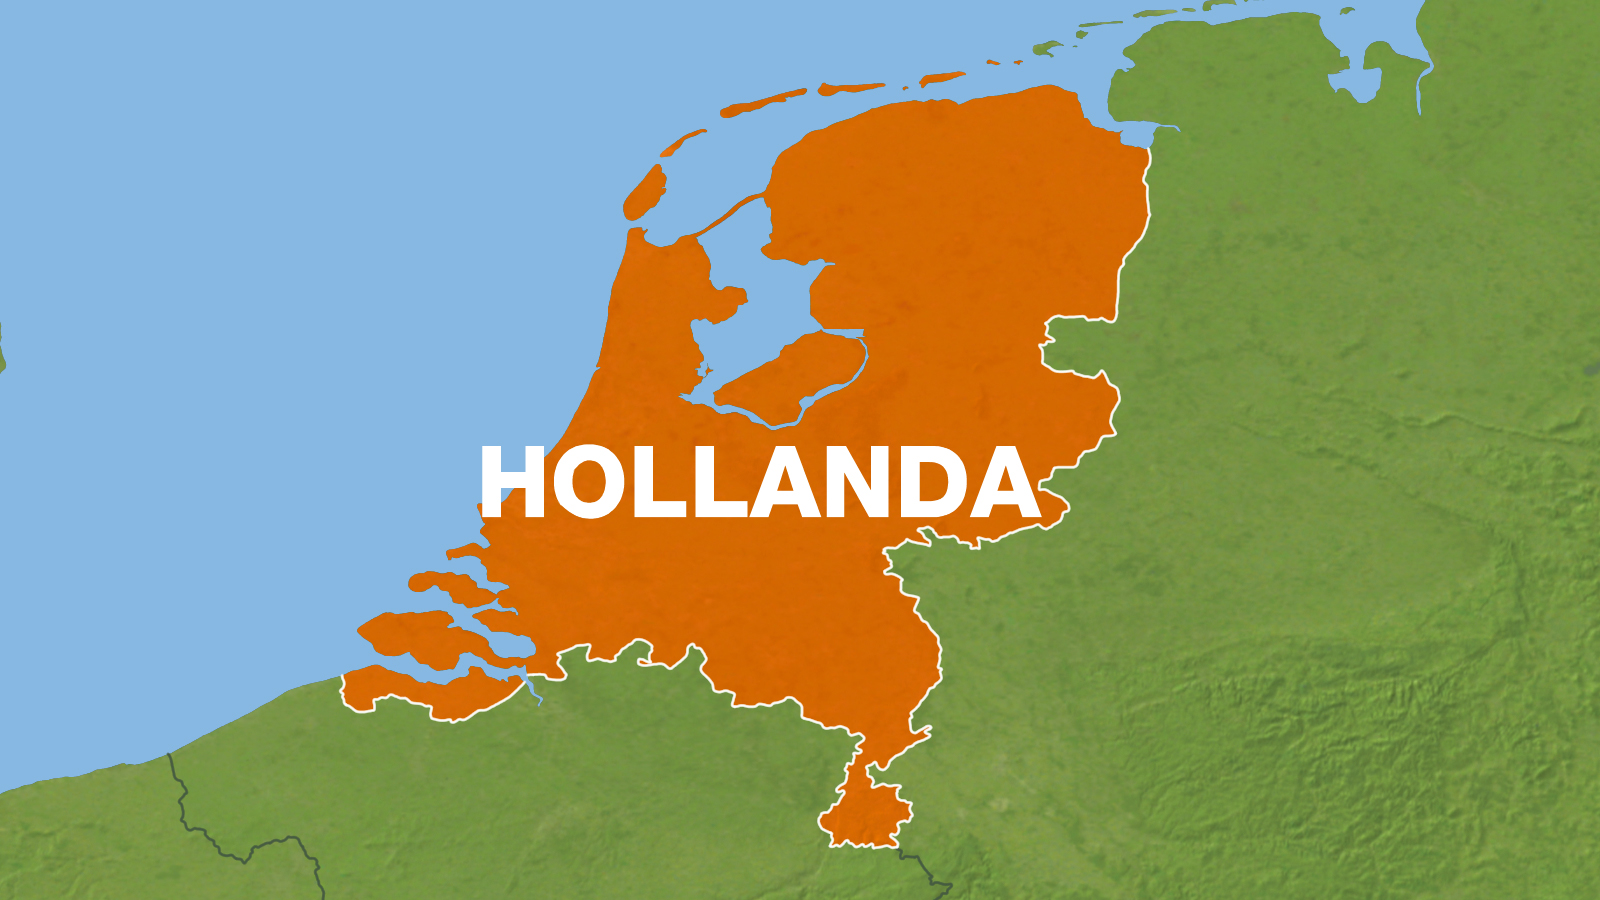 Eski̇ dönem fransa pari̇s anti̇k anitsal tari̇hi̇ turi̇sti̇k yapilar ori̇ji̇nal hari̇tasi çok çok nadi̇r. Ülke profili: Hollanda | Al Jazeera Turk - Ortadoğu